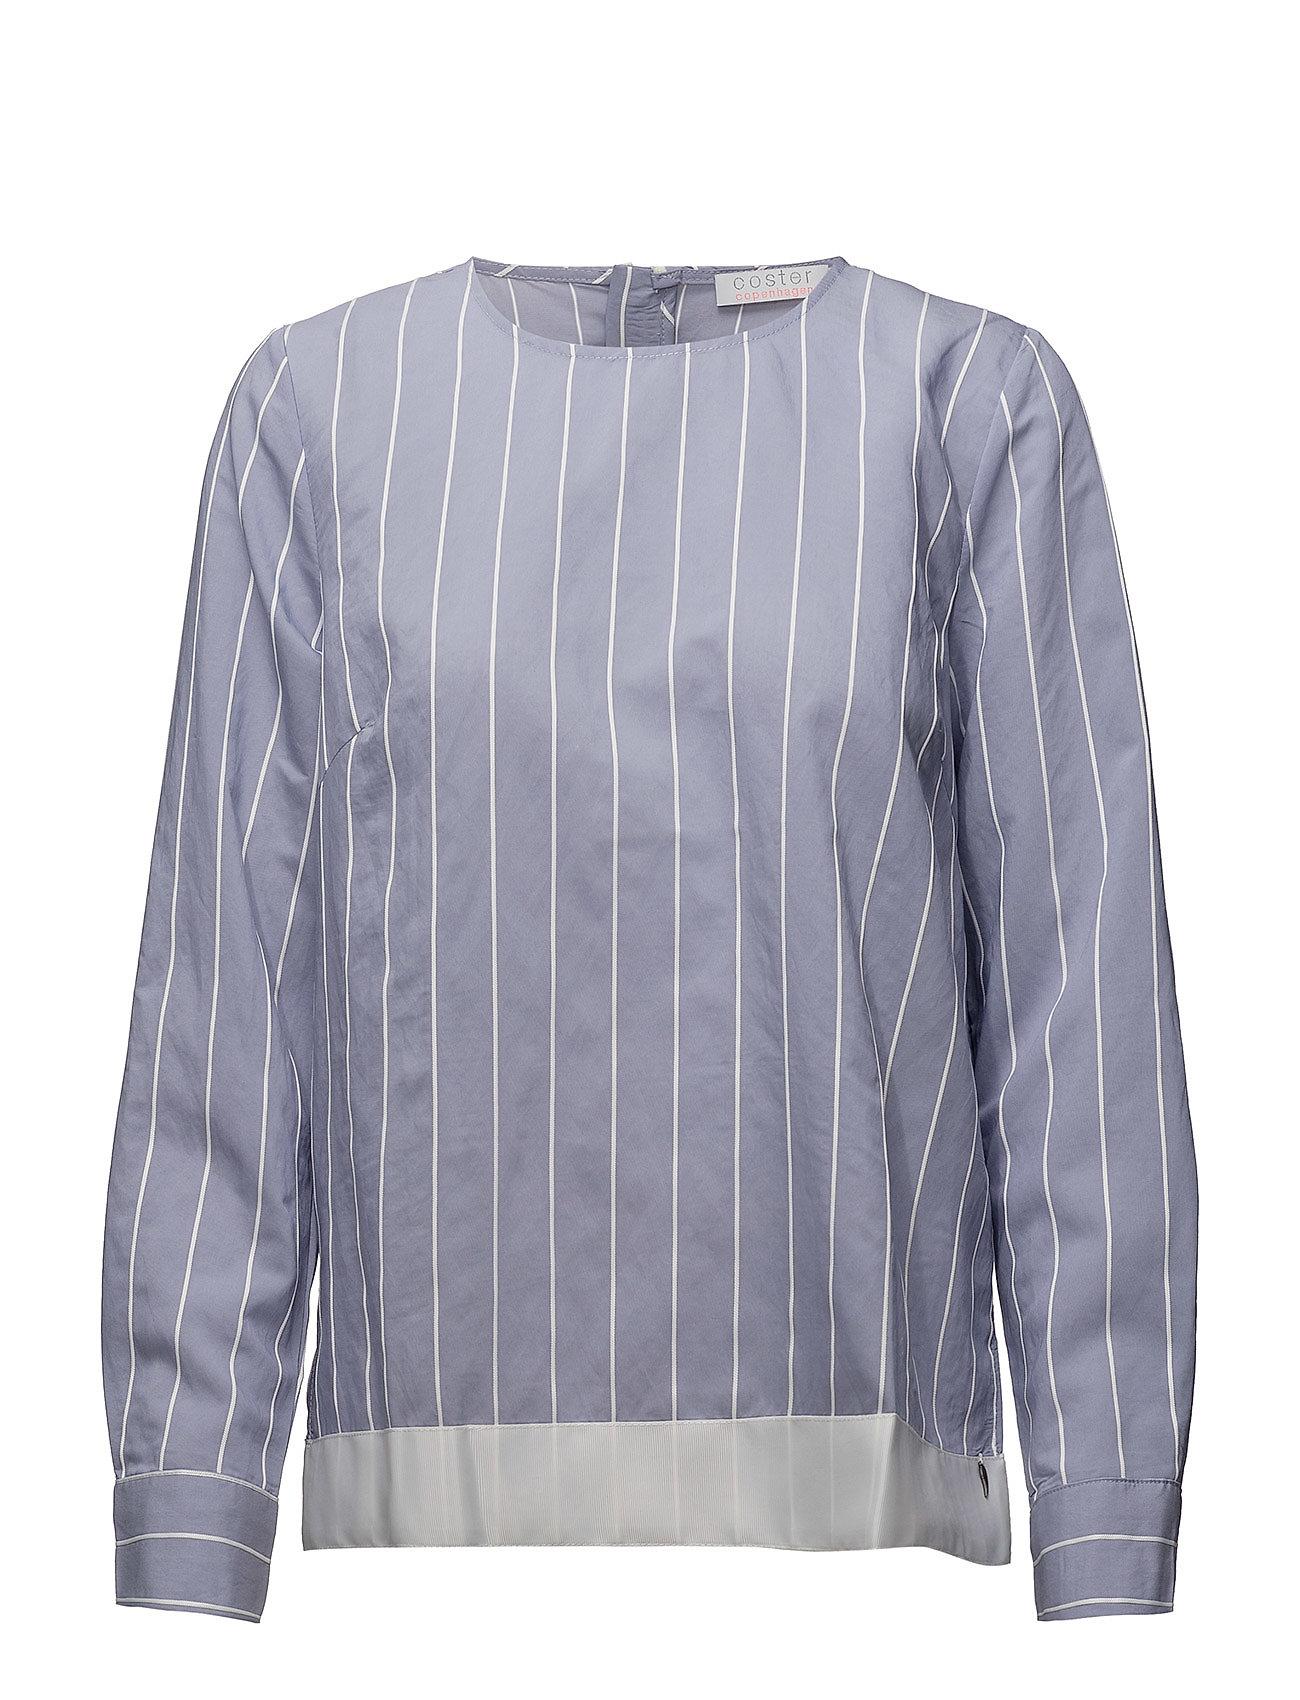 Coster Copenhagen Striped shirt blouse w. ribbon edge Ögrönlar